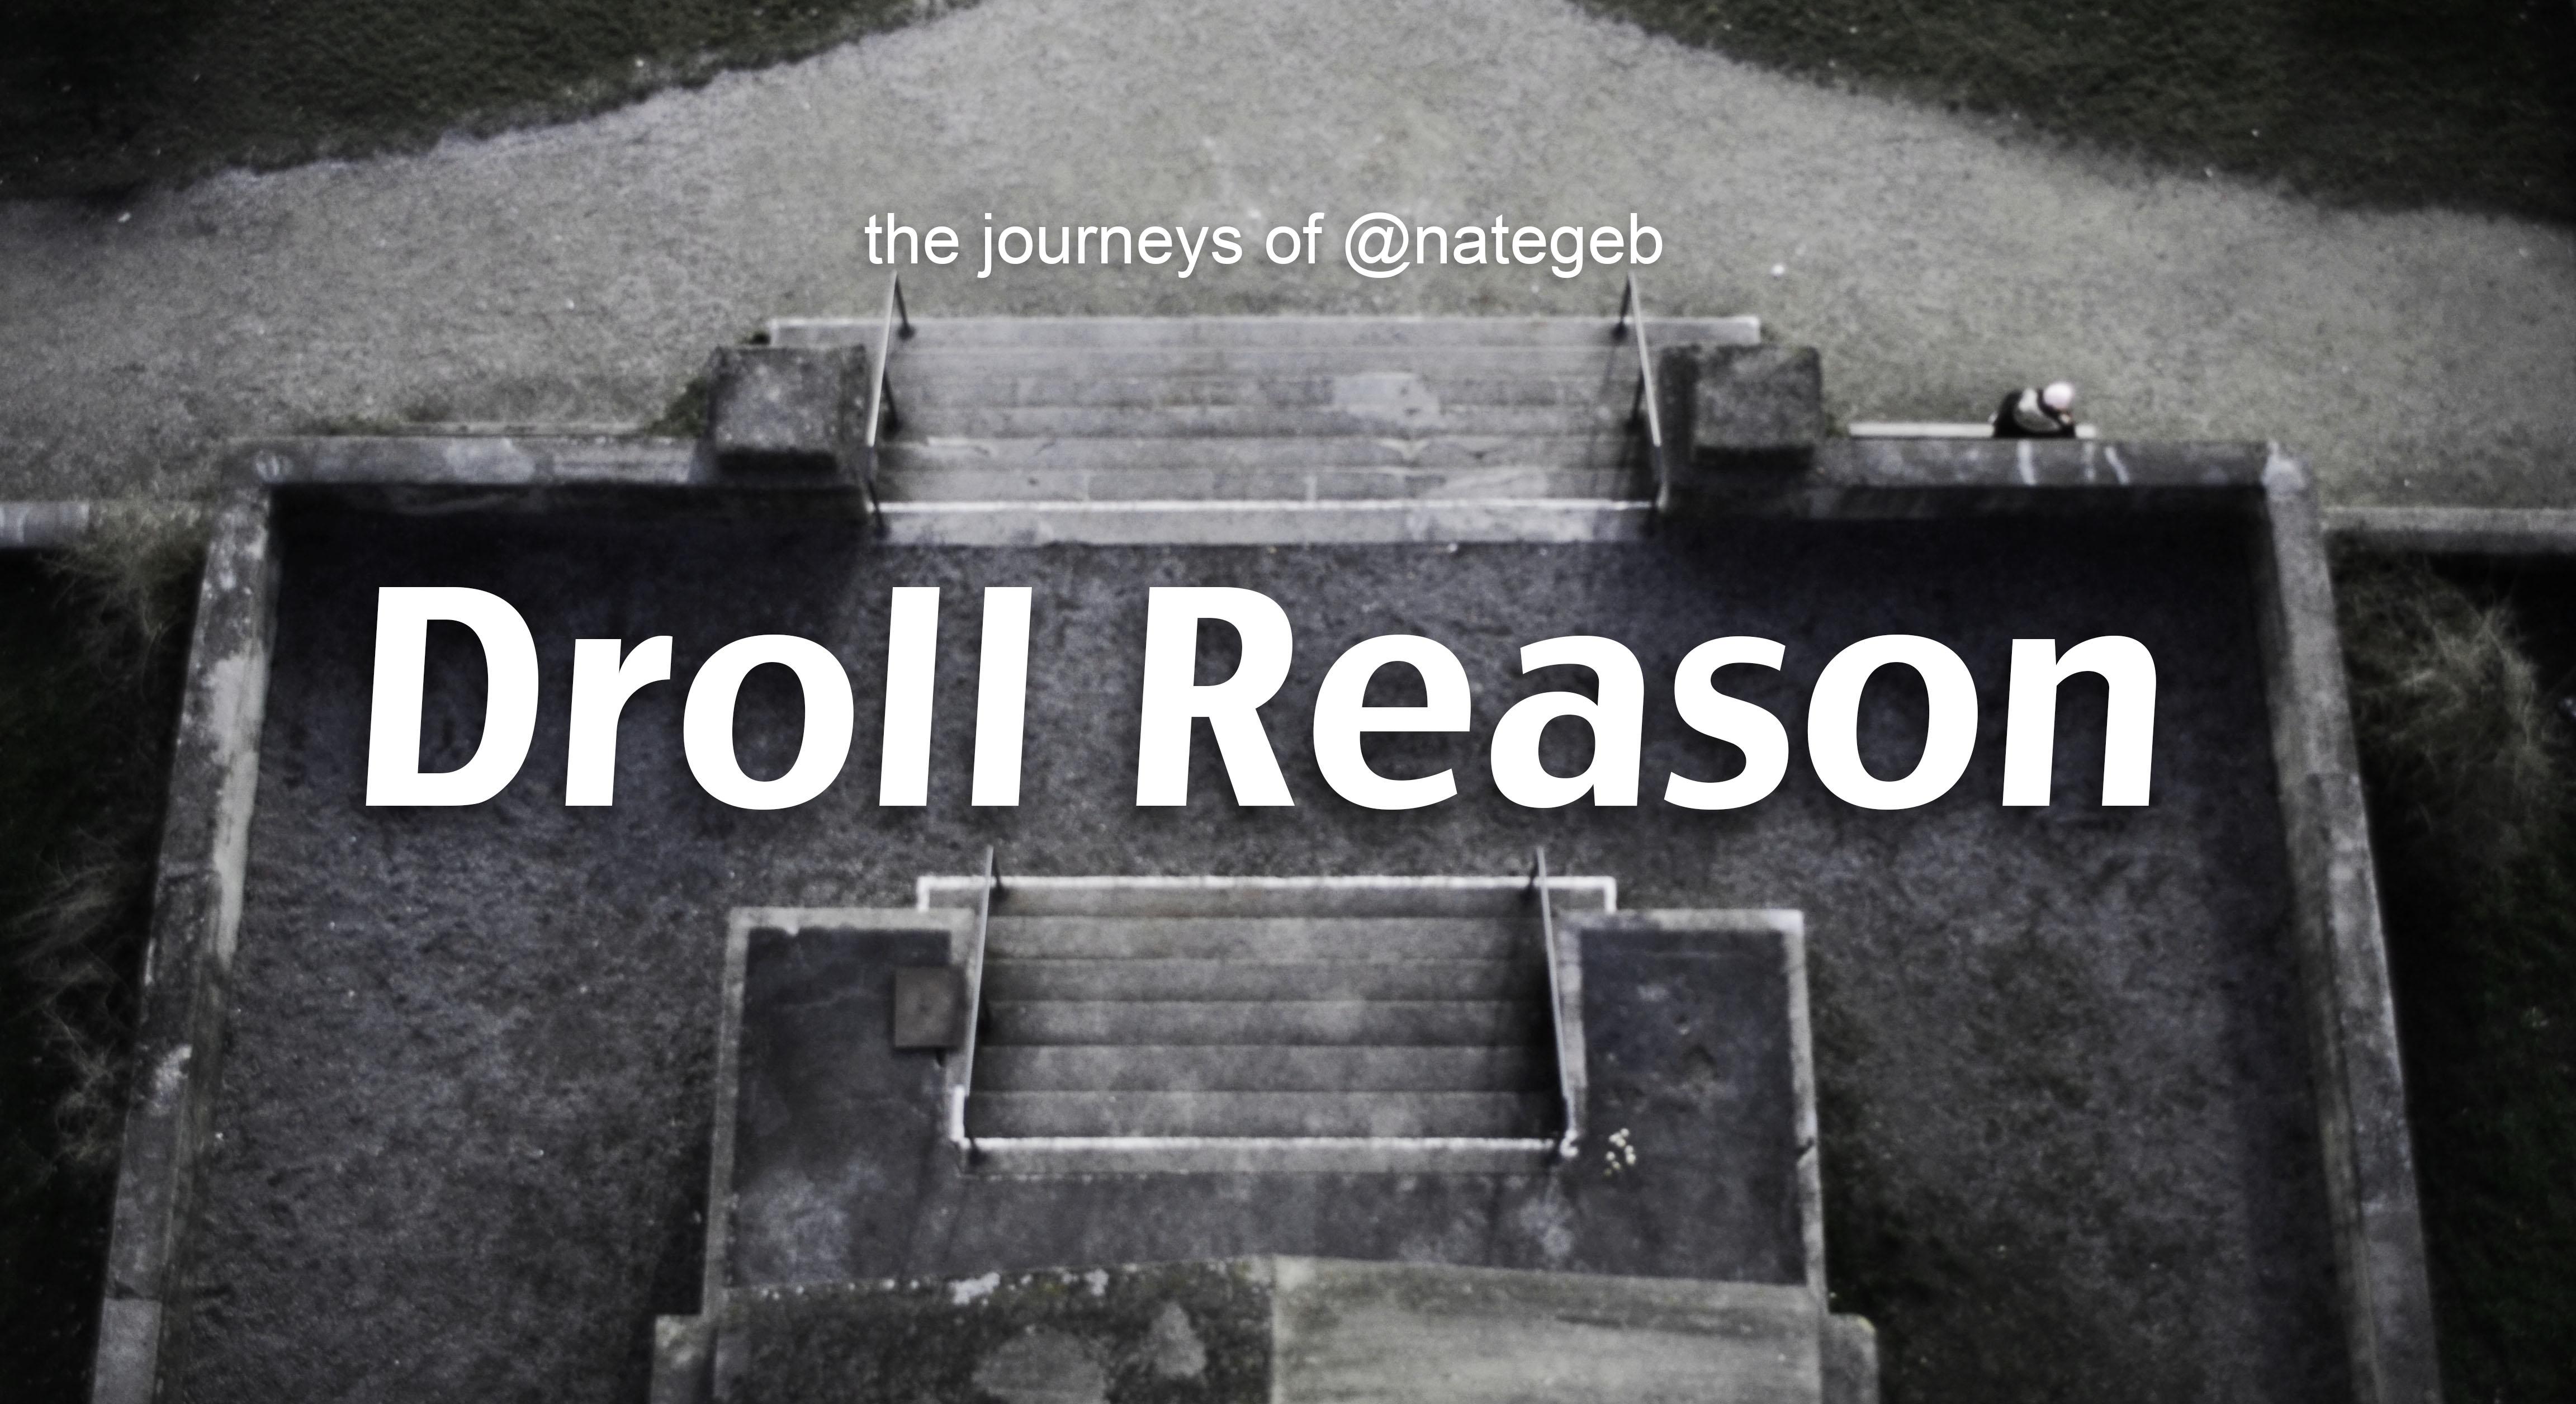 droll reason